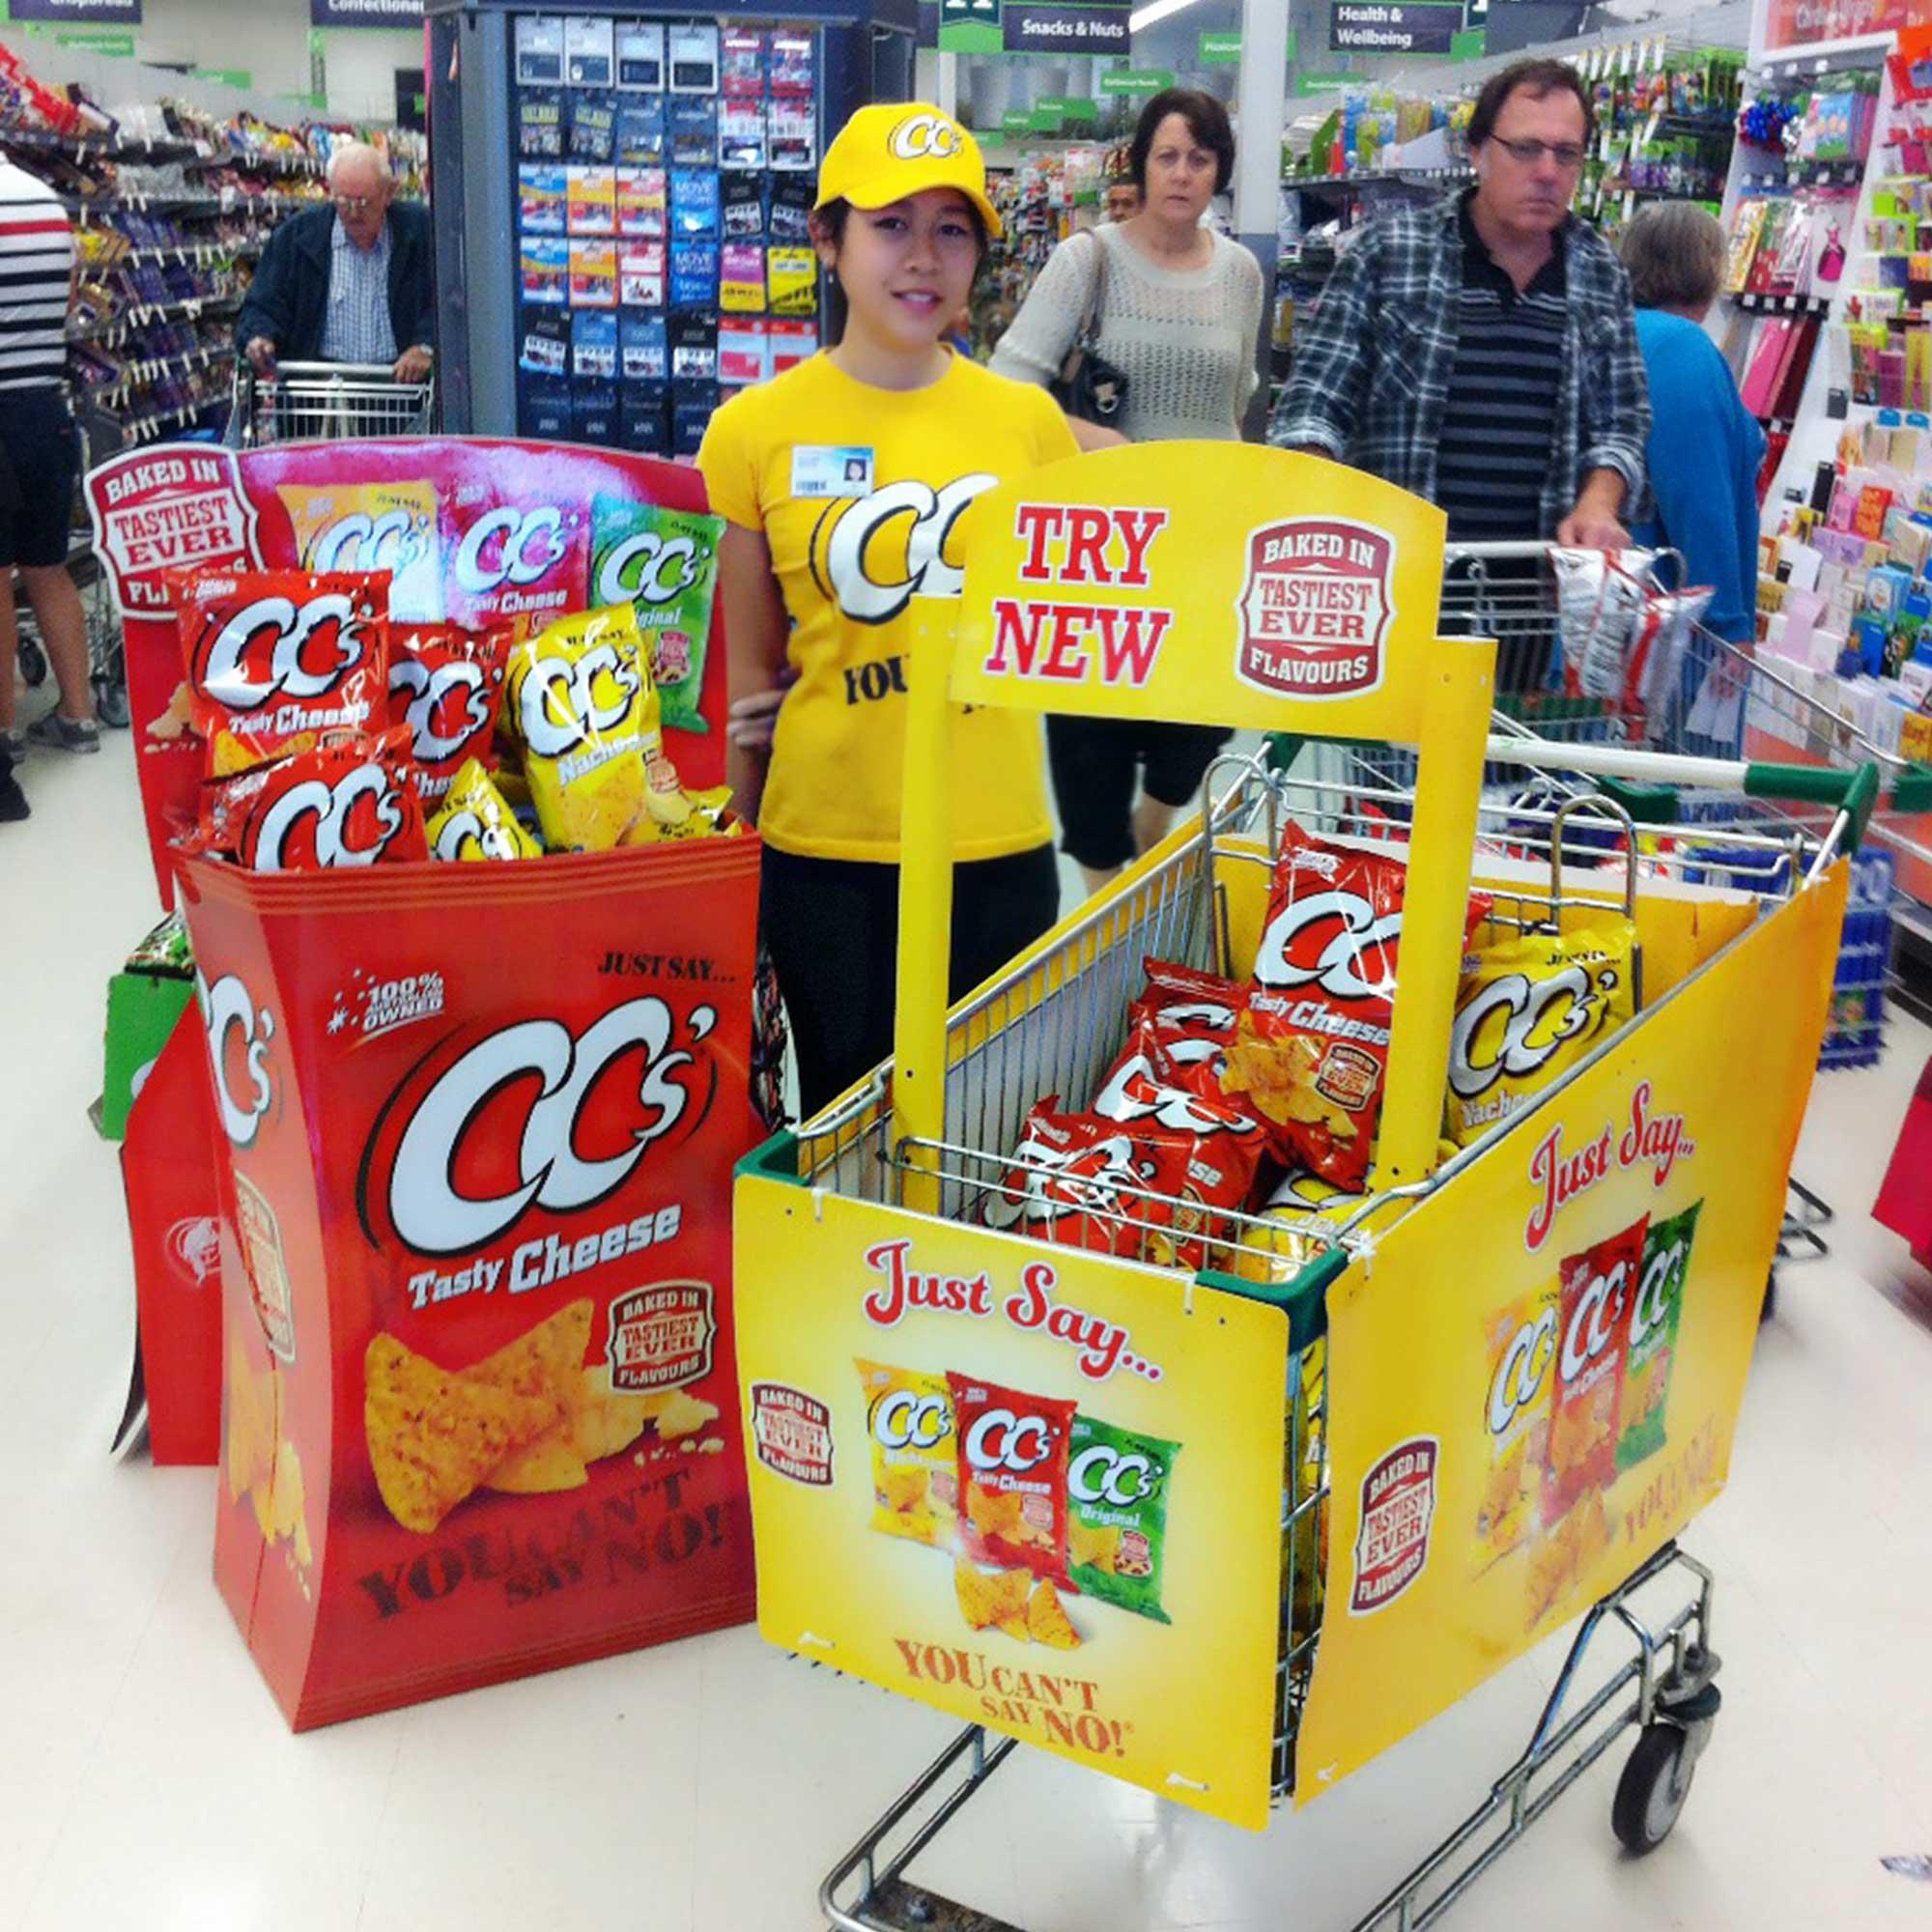 Snack Brands 'CC's'